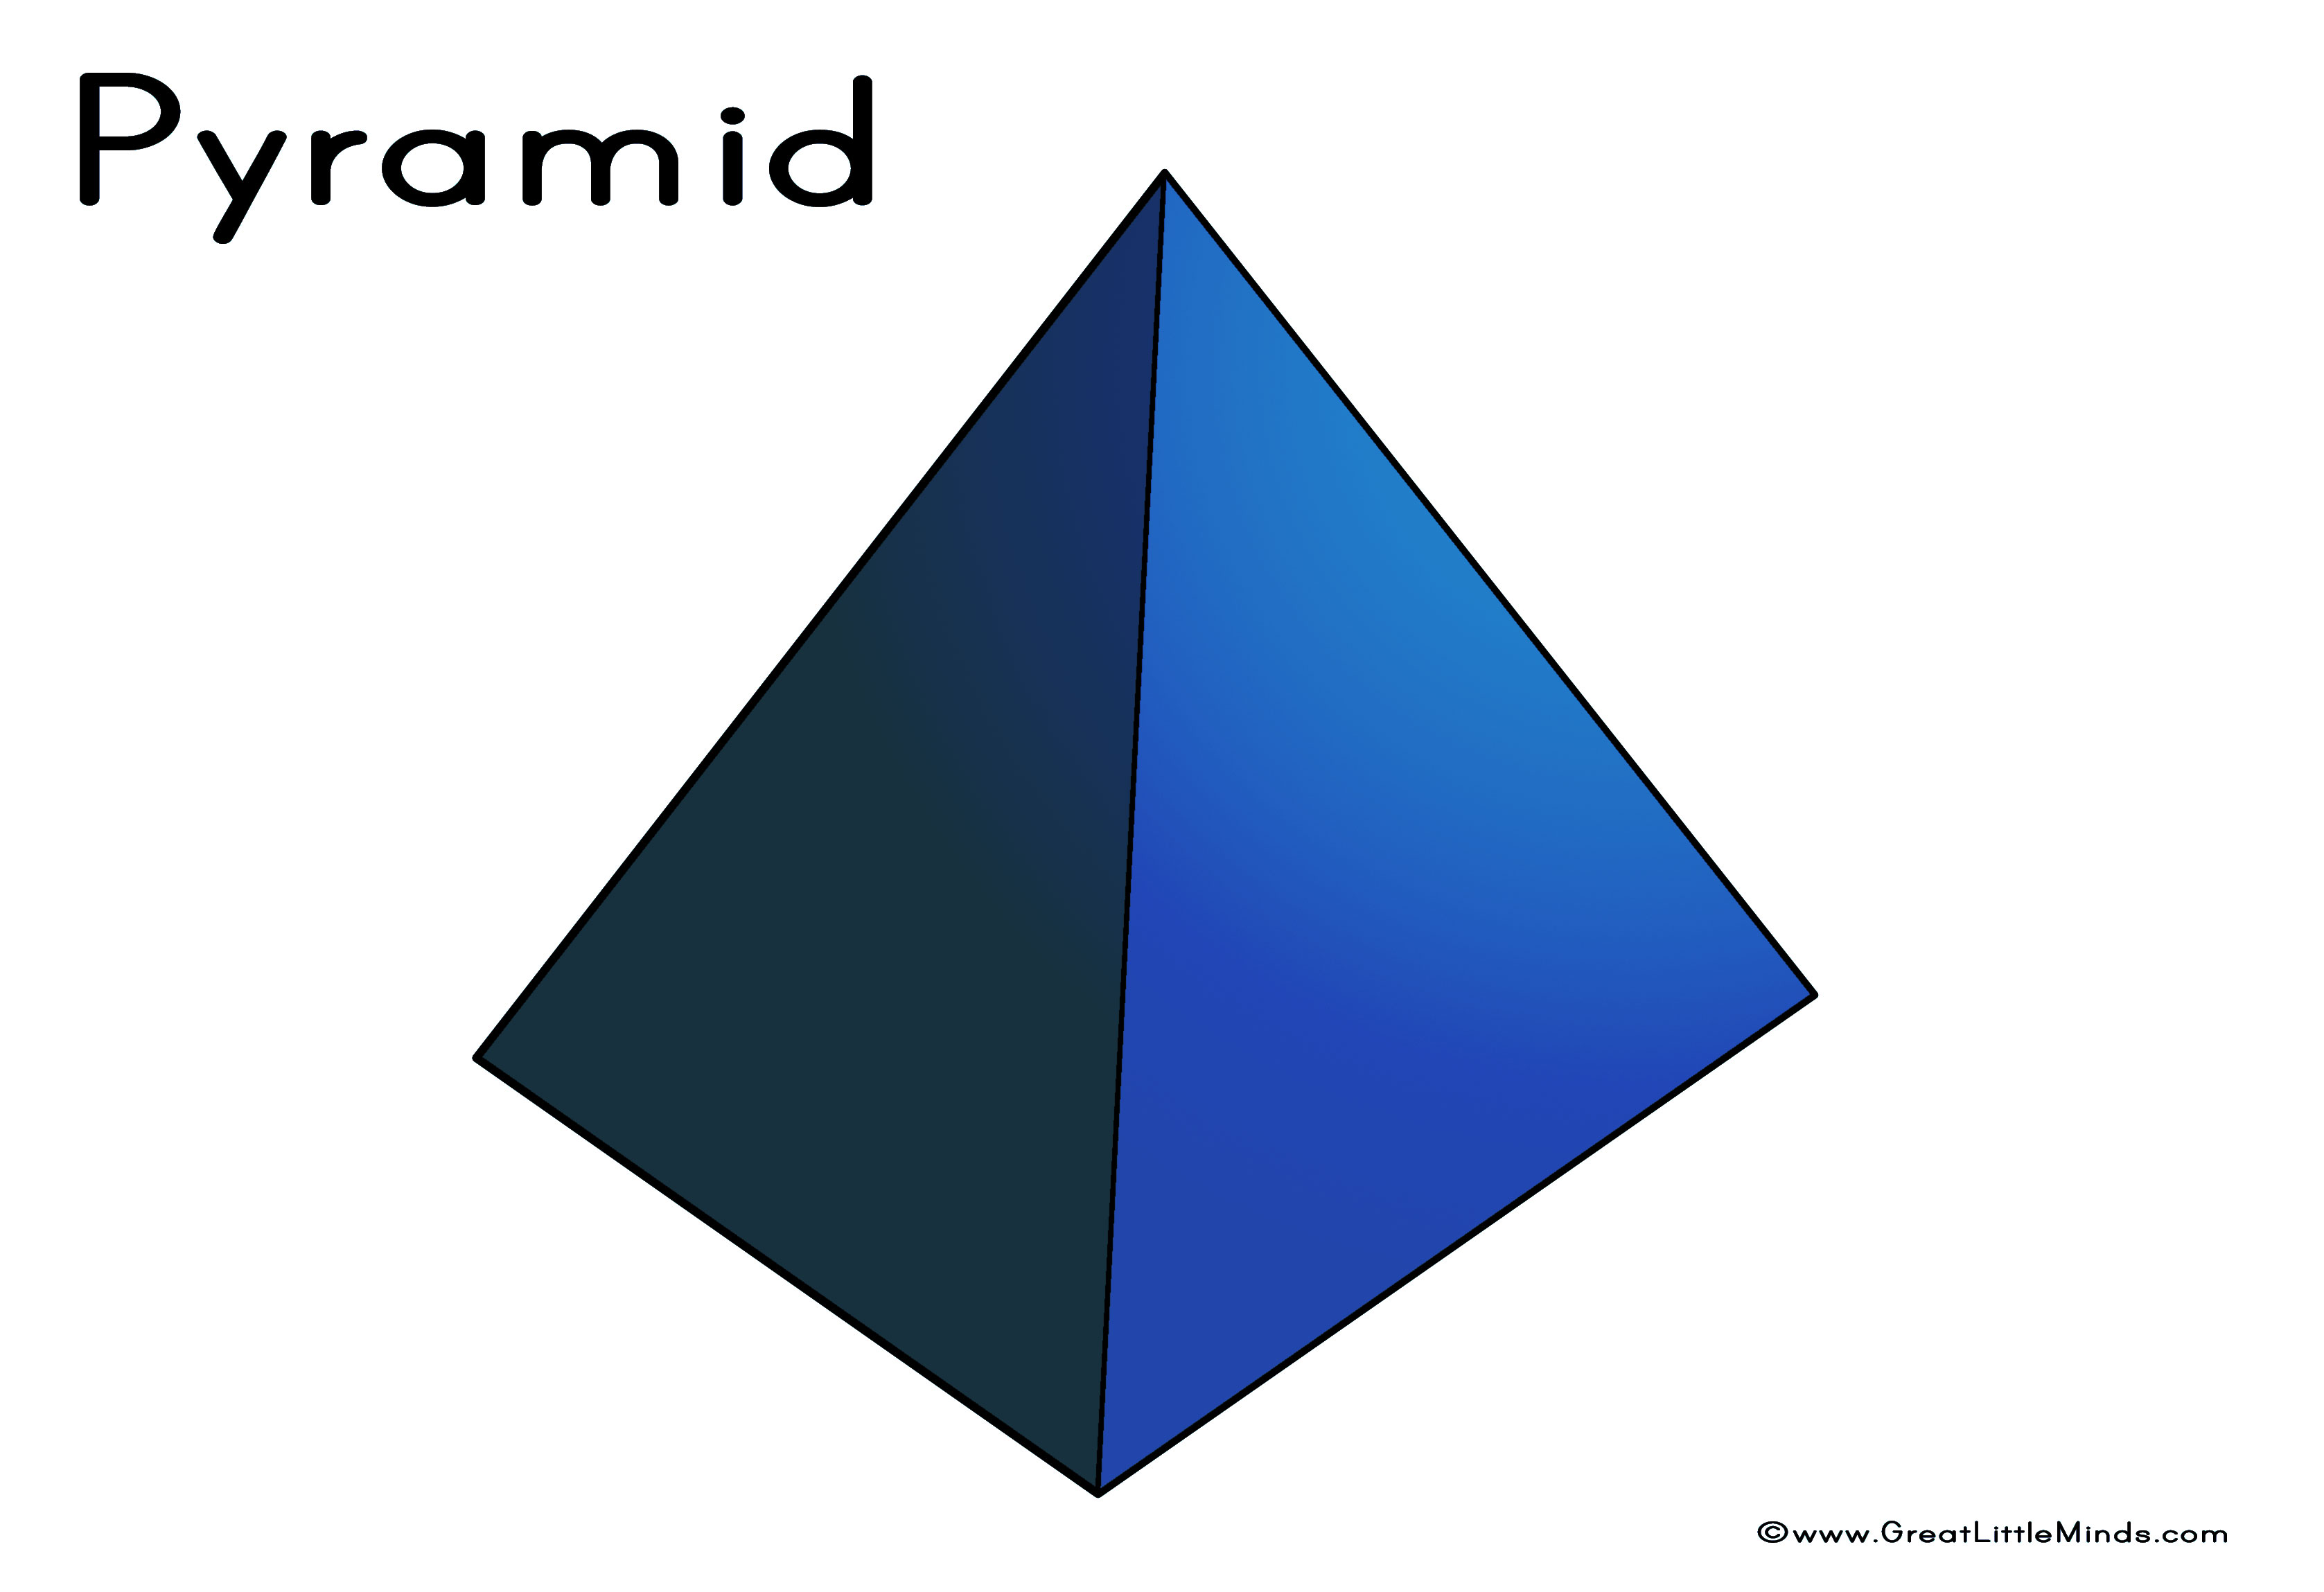 Pyramid 3D Shape.